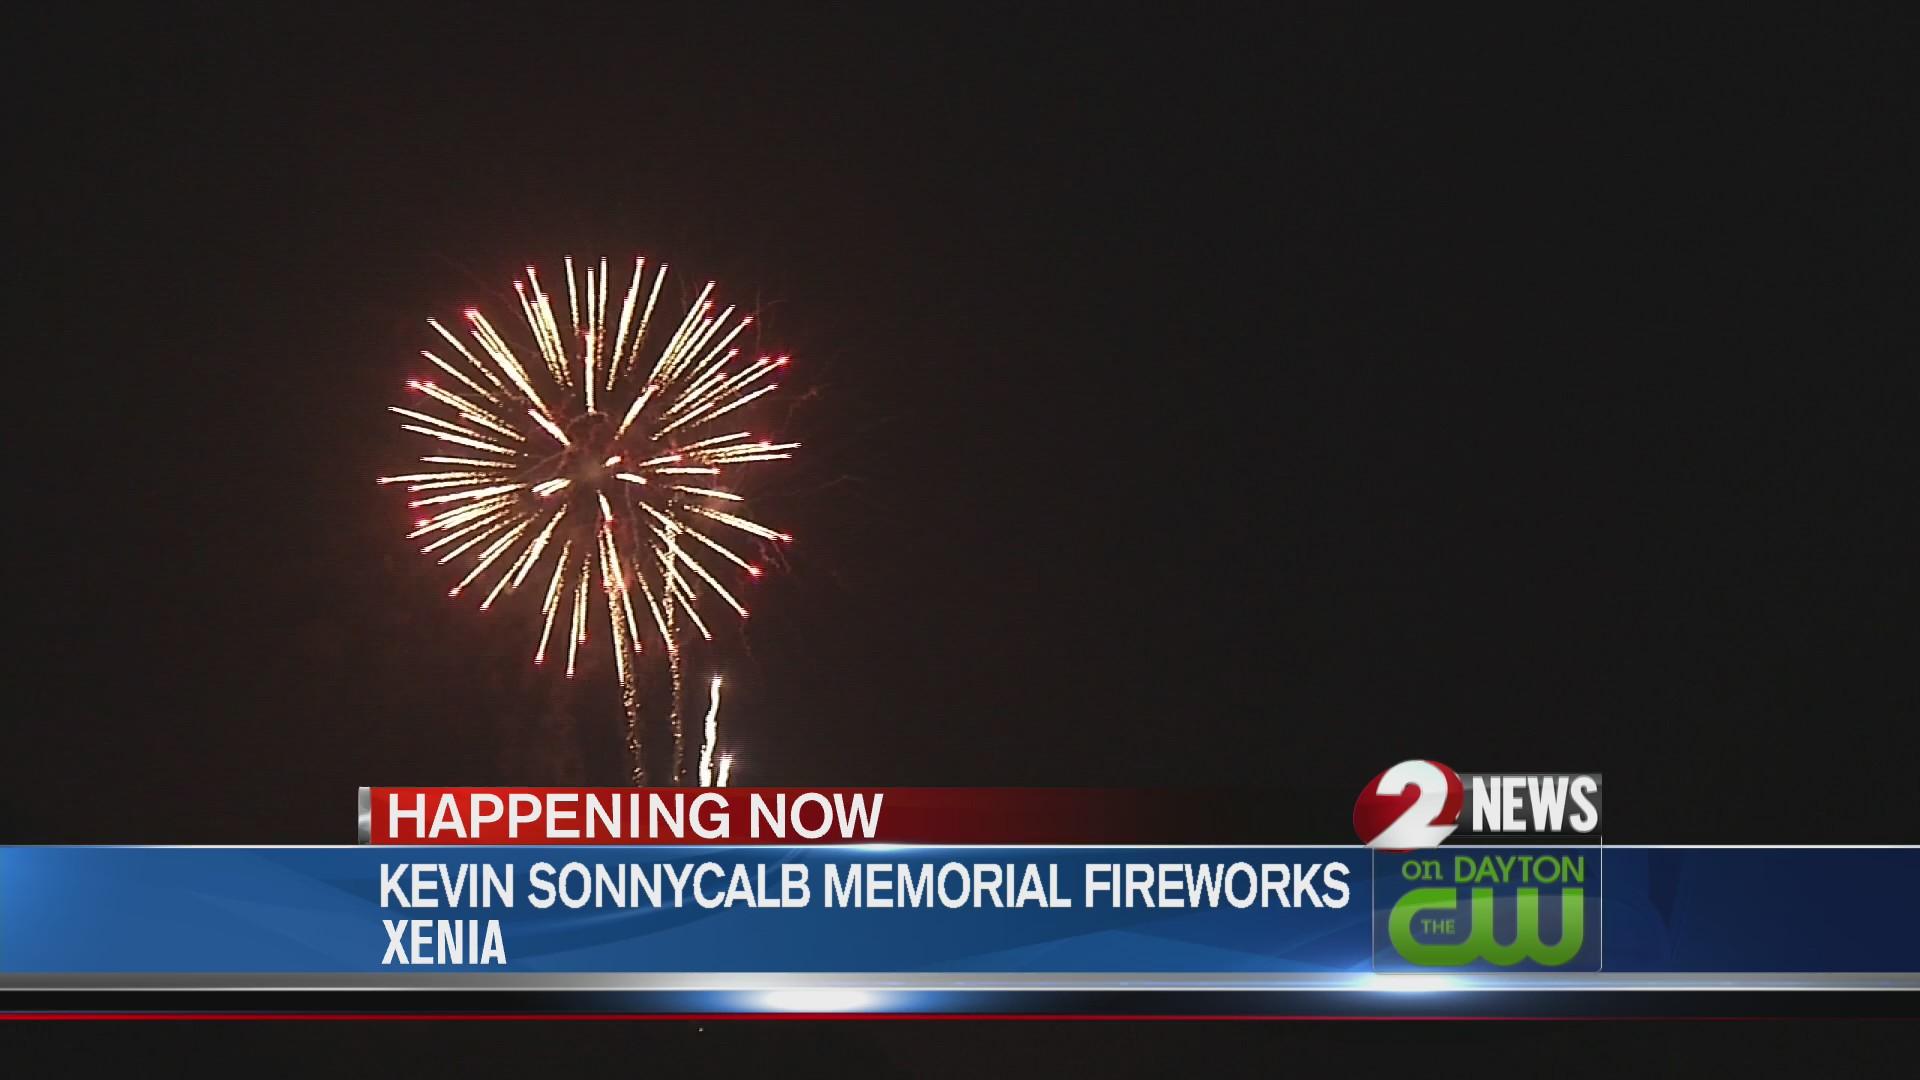 Xenia fireworks